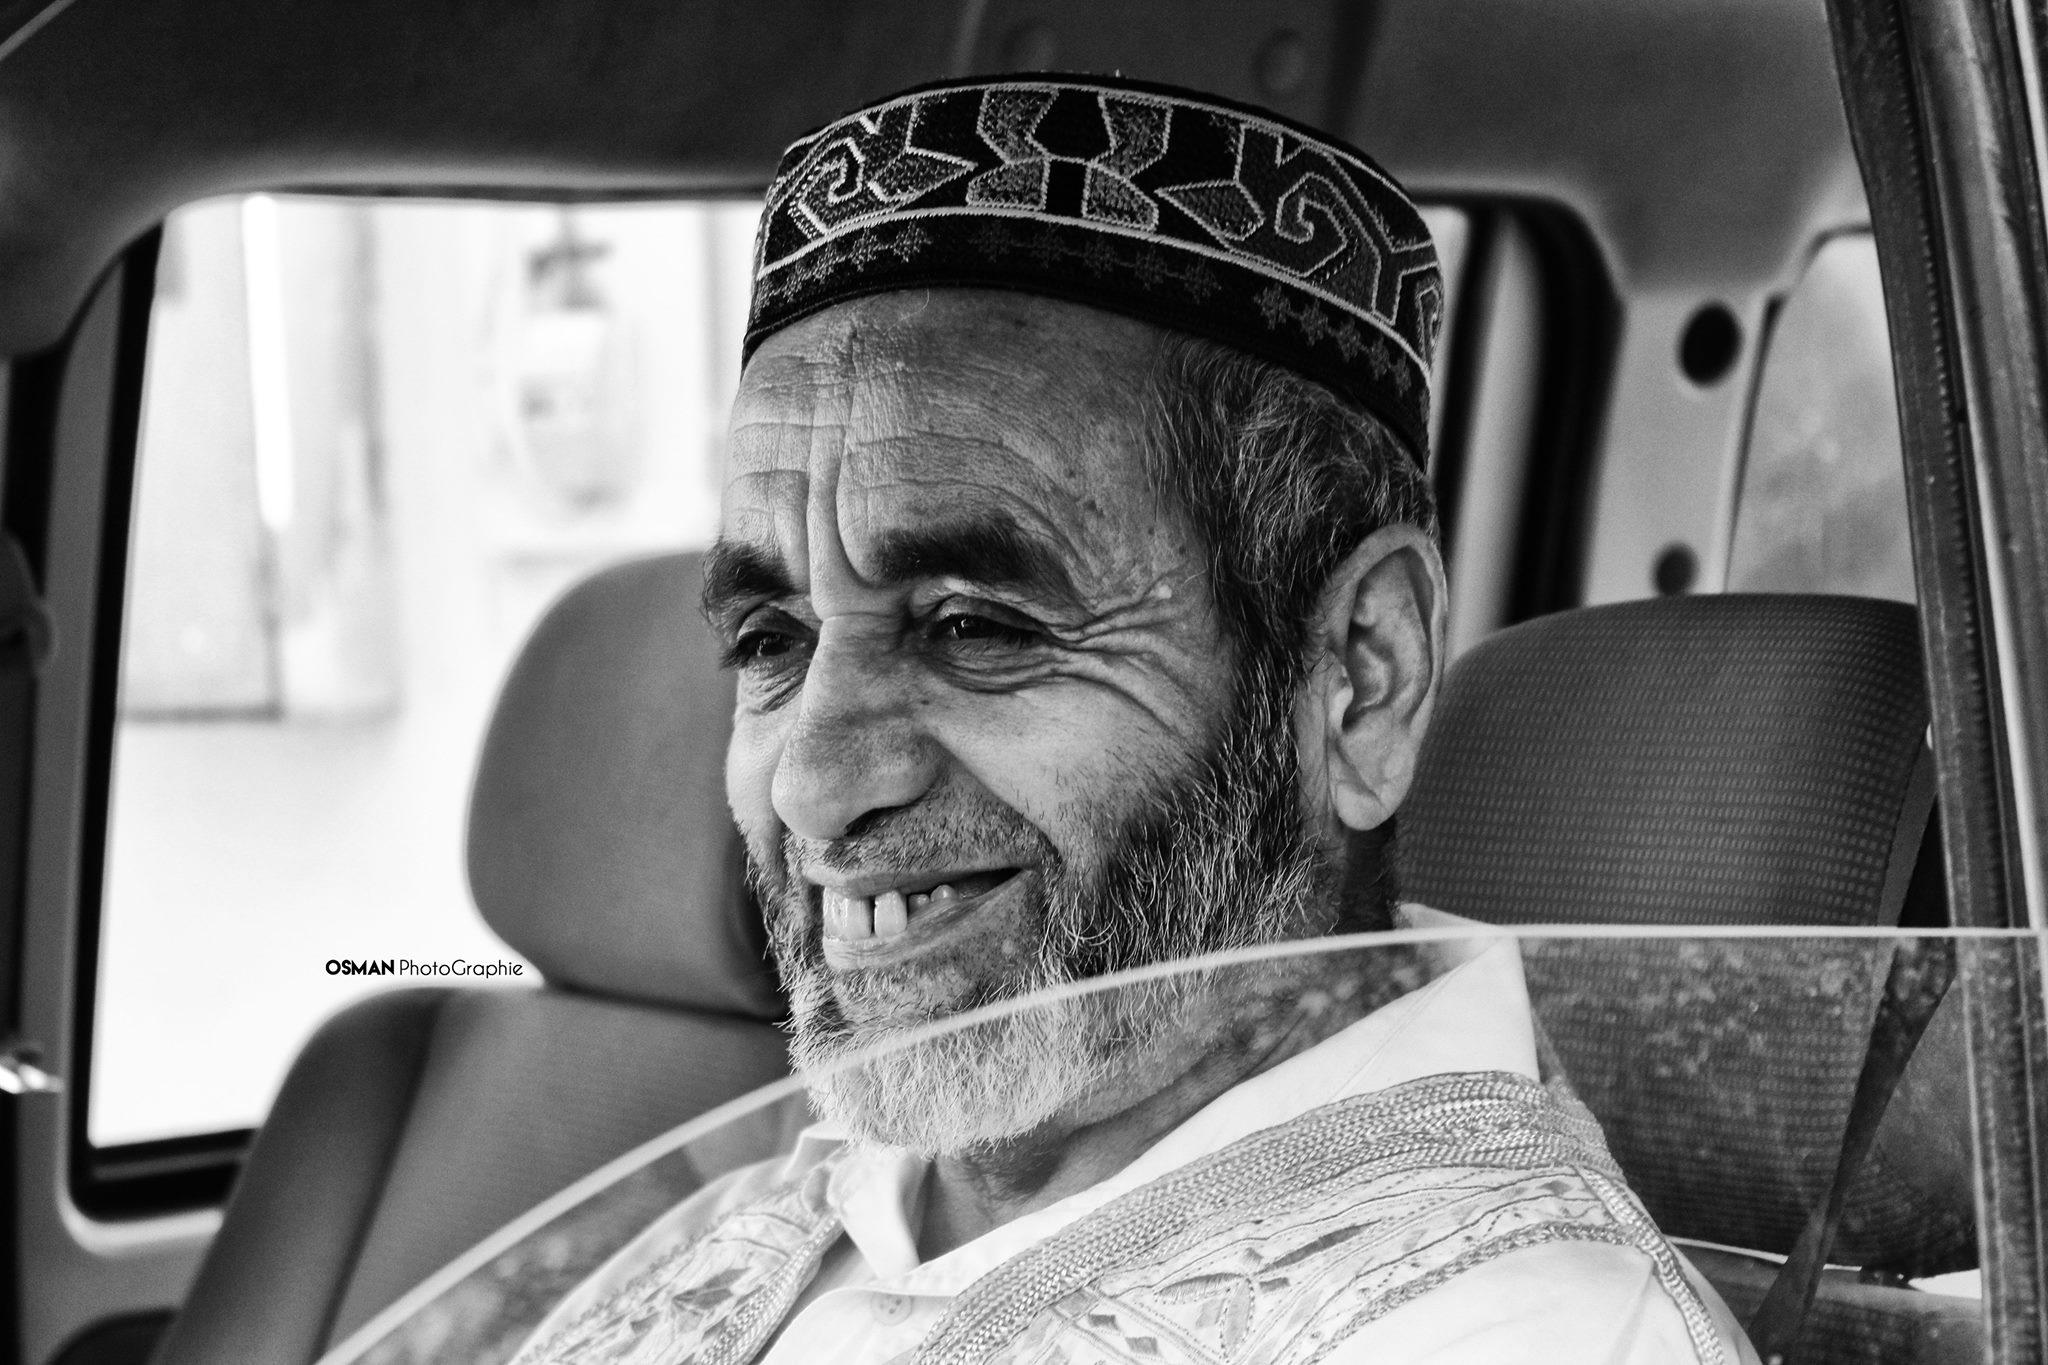 Untitled by Othmane Hadji